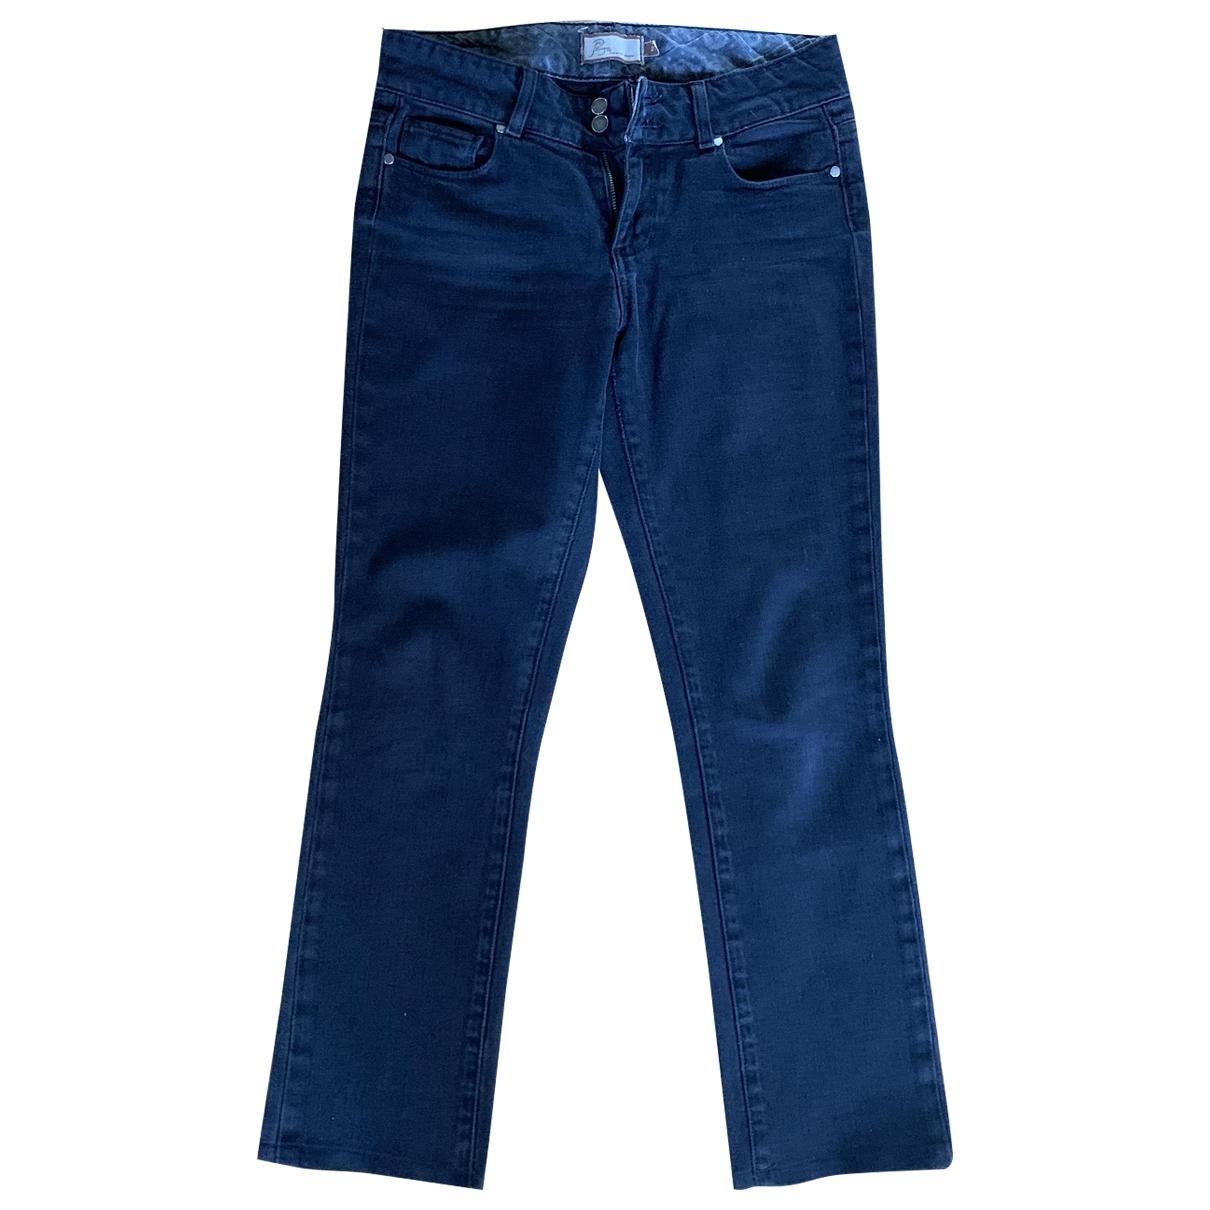 Paige Jeans \N Black Denim - Jeans Jeans for Women 27 US